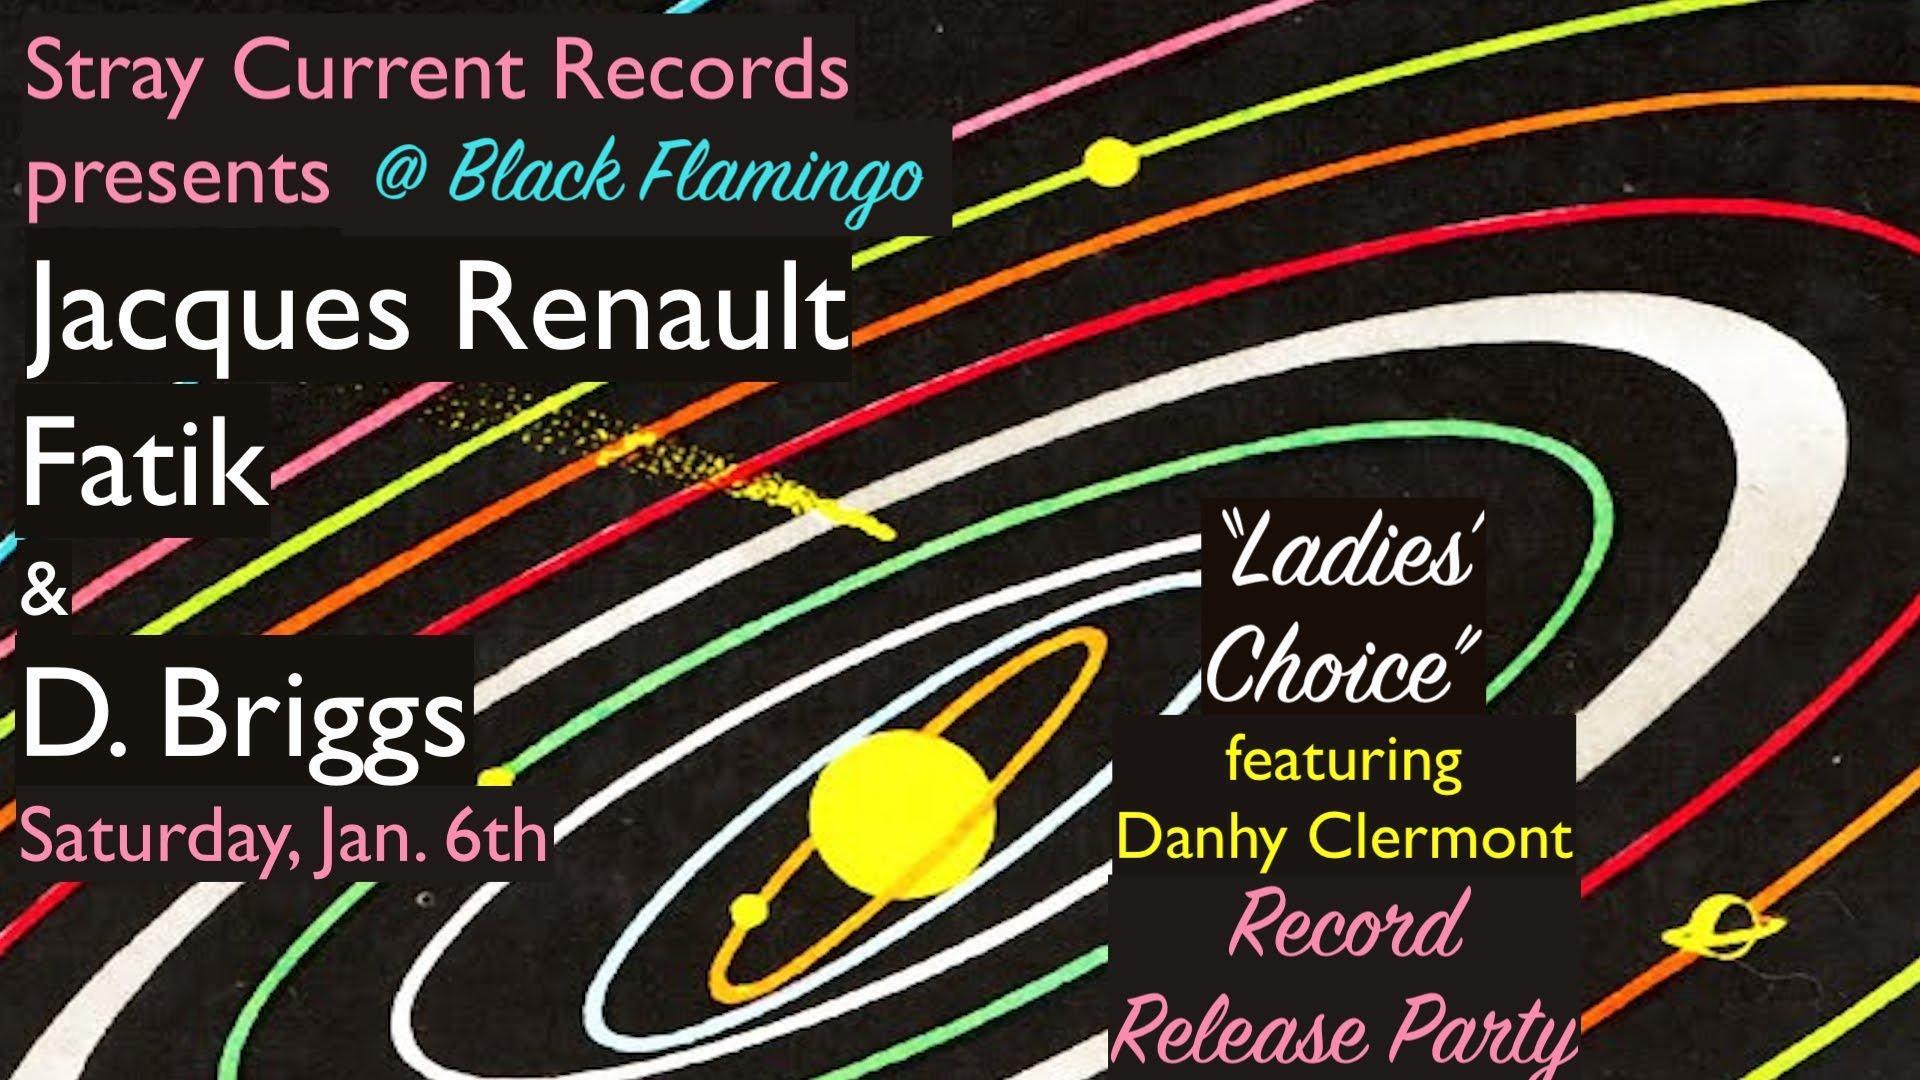 Black Flamingo FB event flier - Jan 6.jpg